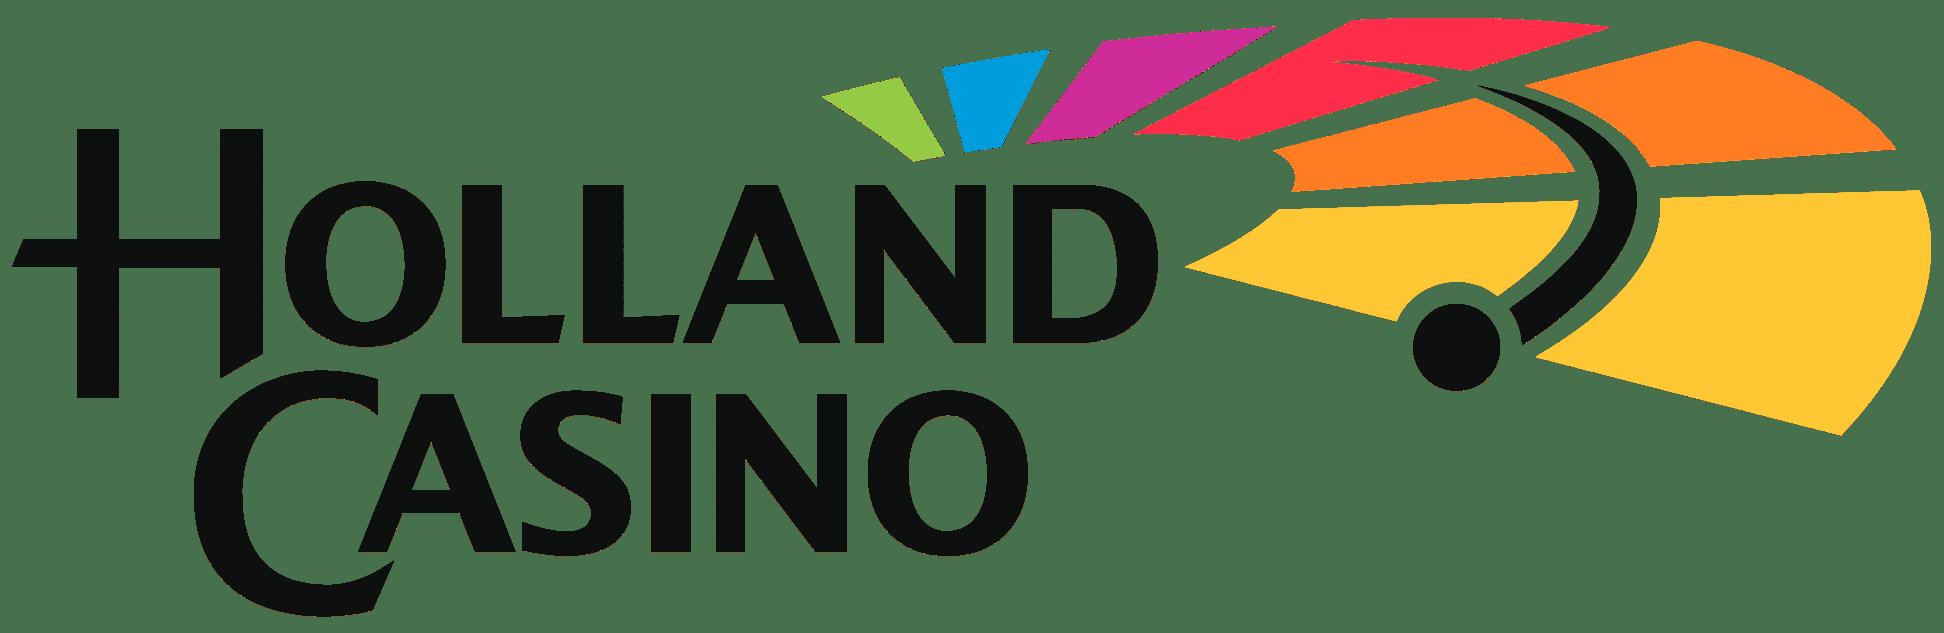 Holland Casino logo PNG zwart via CasinoNieuws.nl